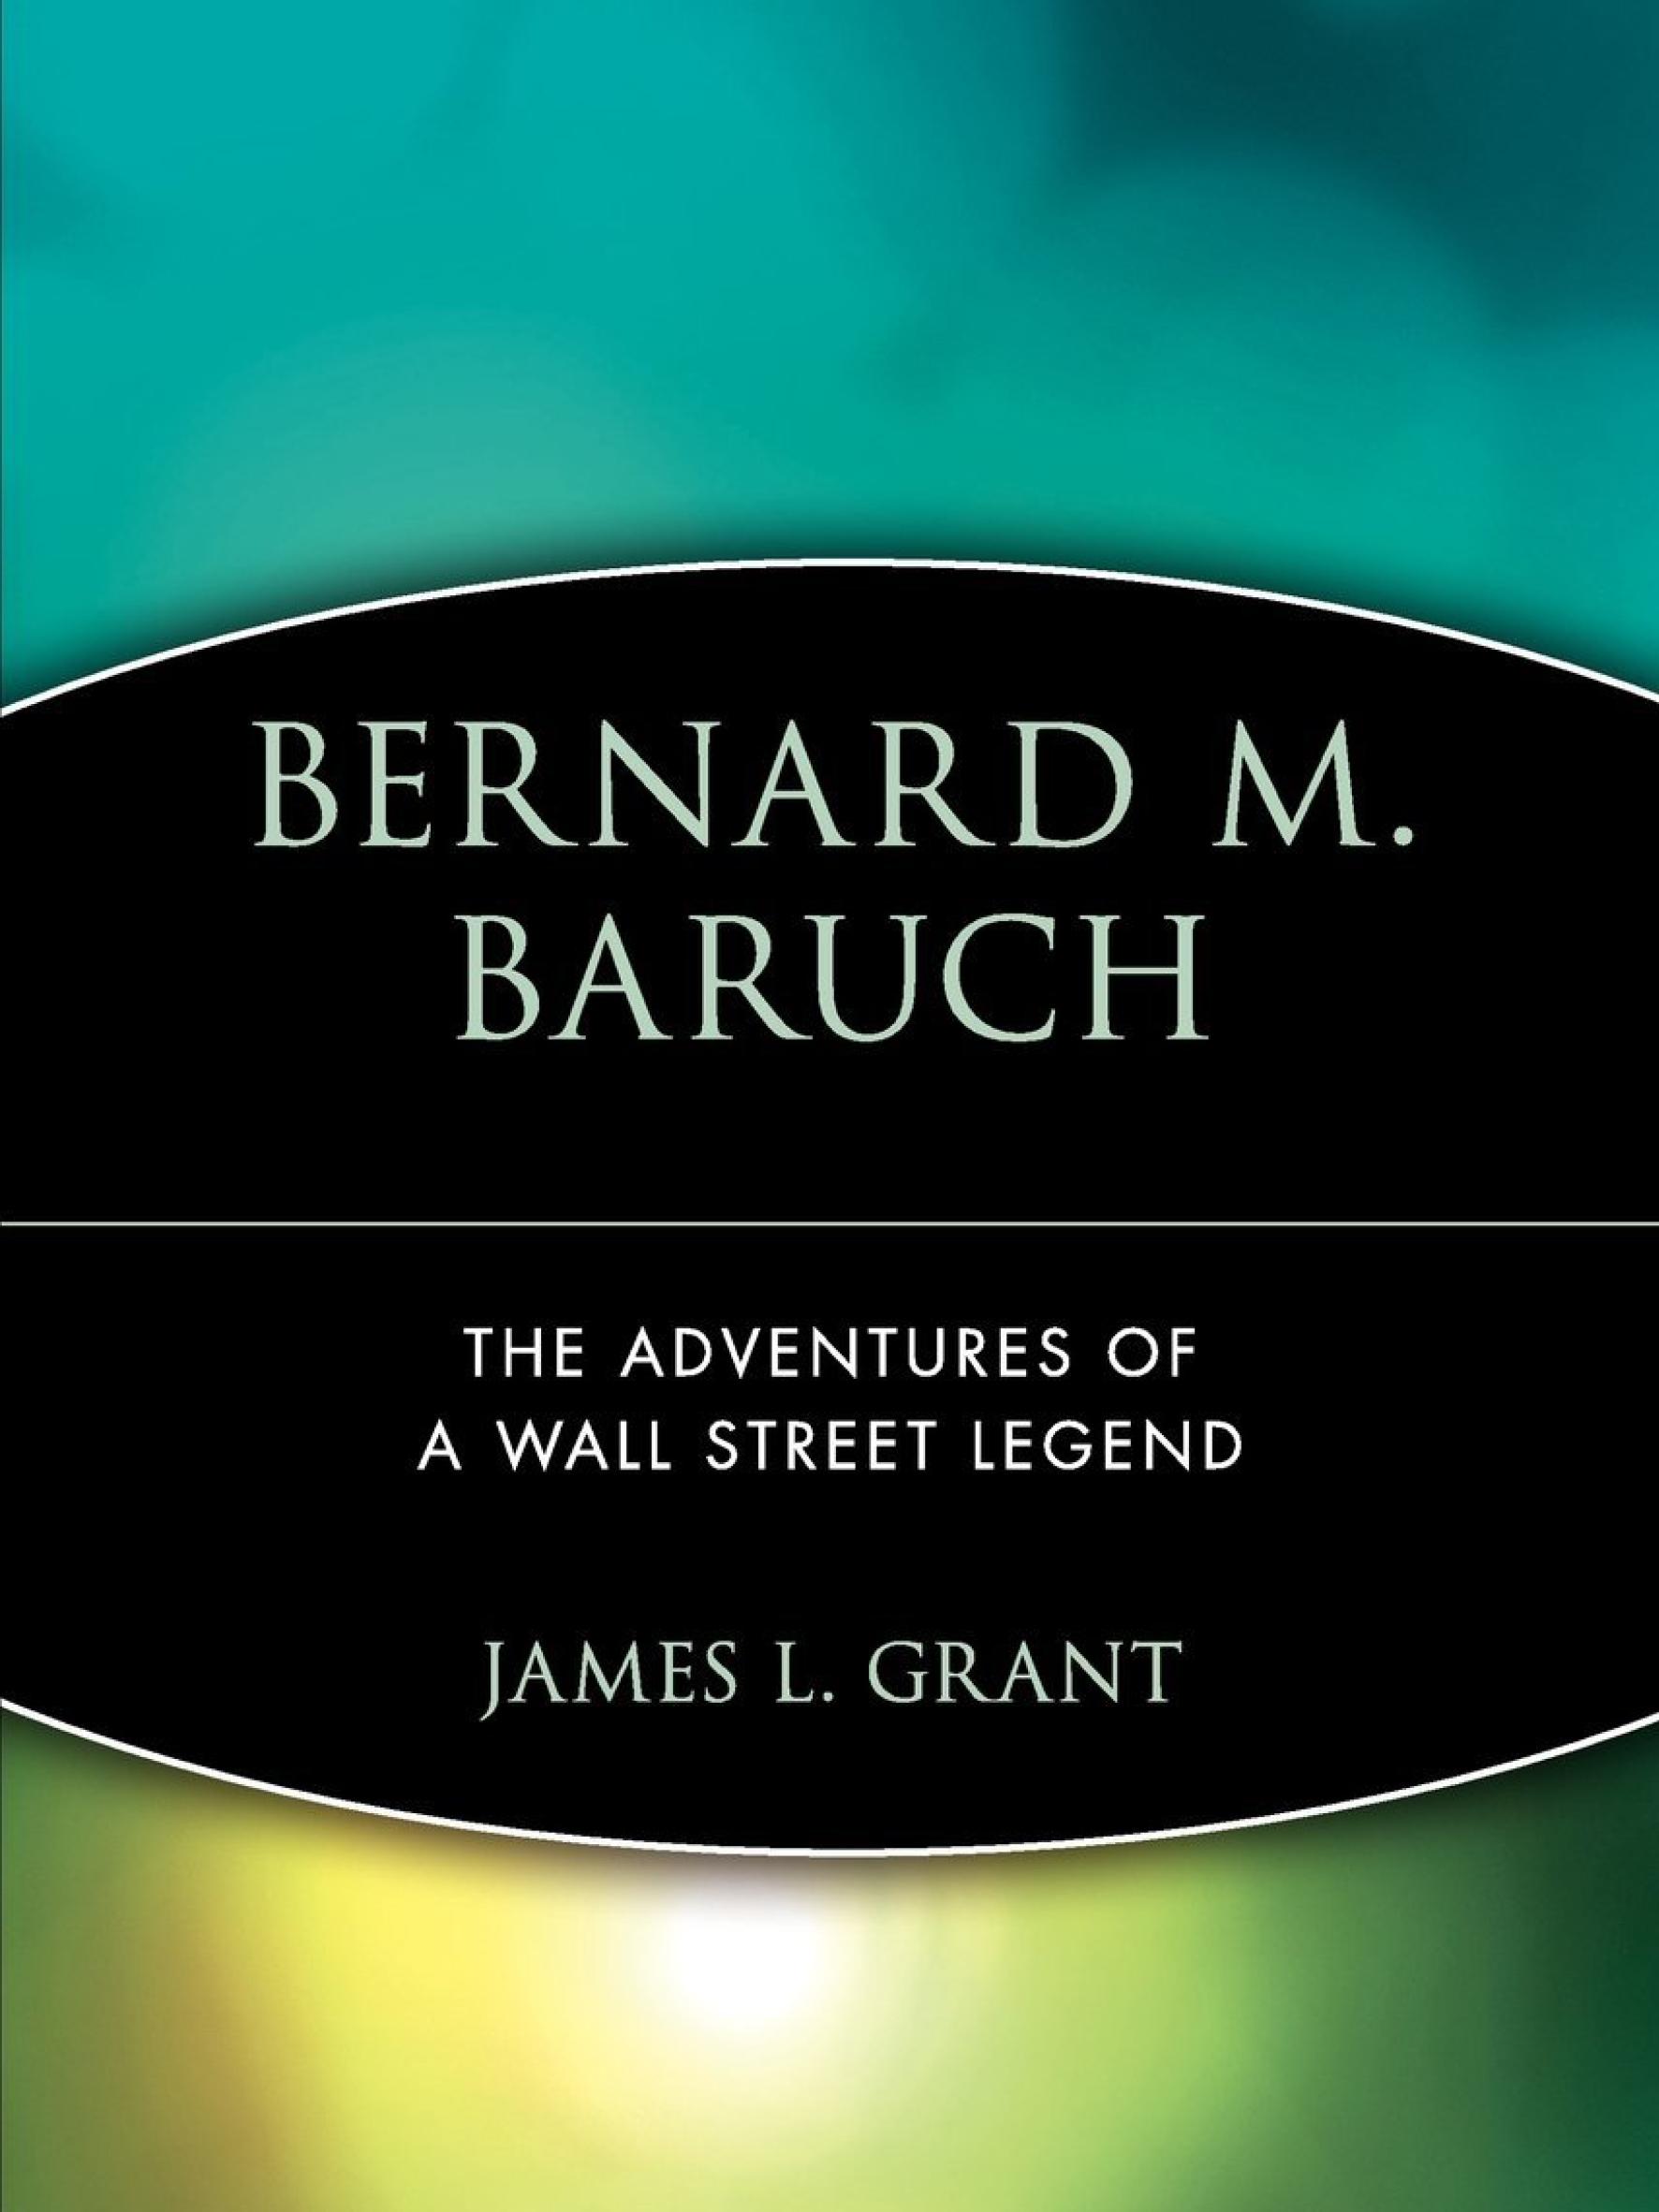 Bernard Baruch: The Adventures Of A Wall Street Legend.     James Grant    1982